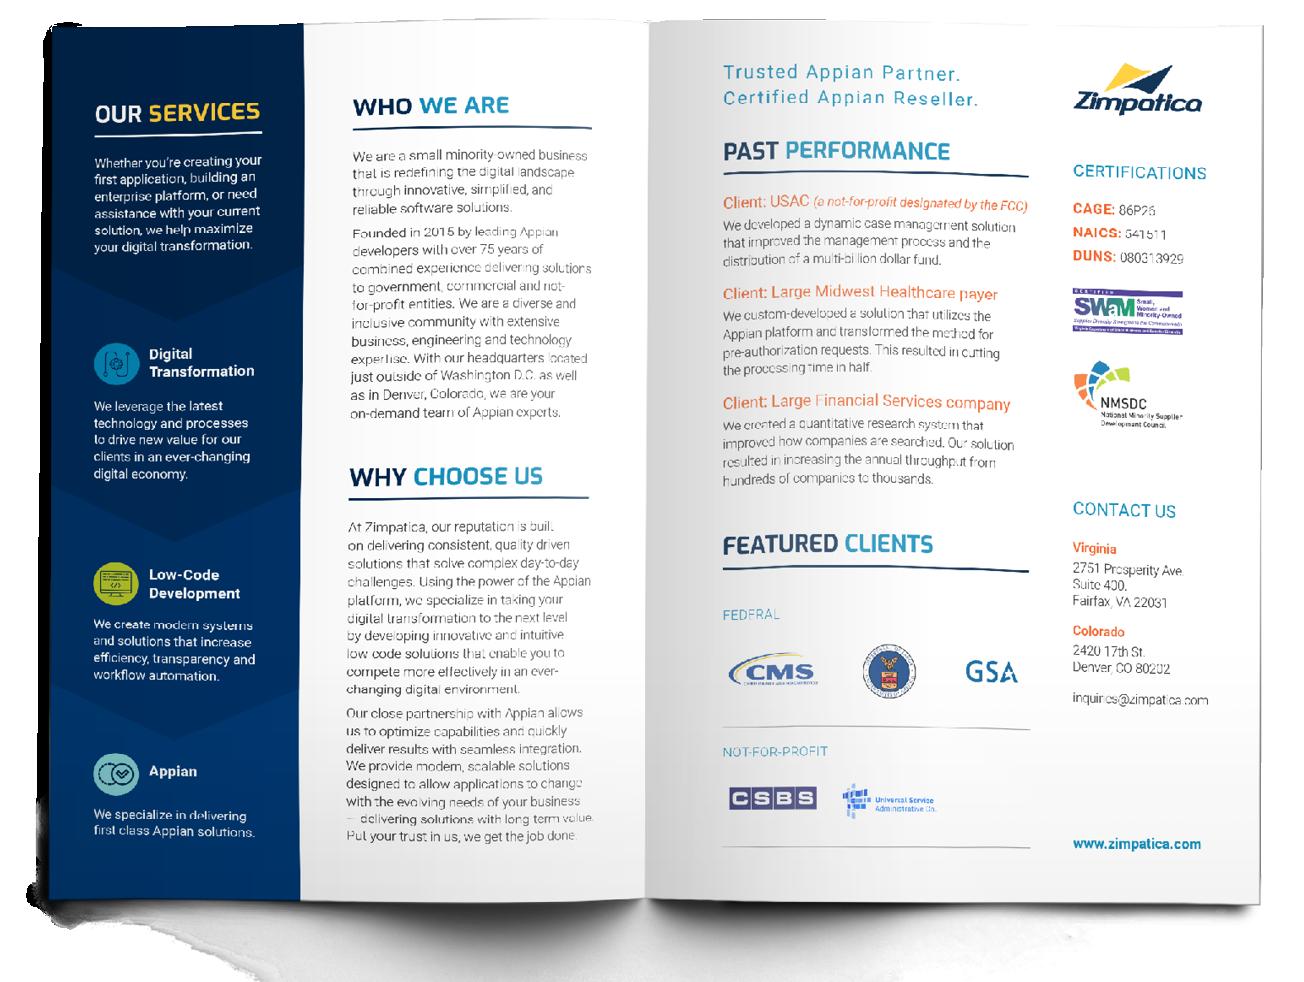 03-6801-Zimpatica-Brand Guidelines Brochure 2